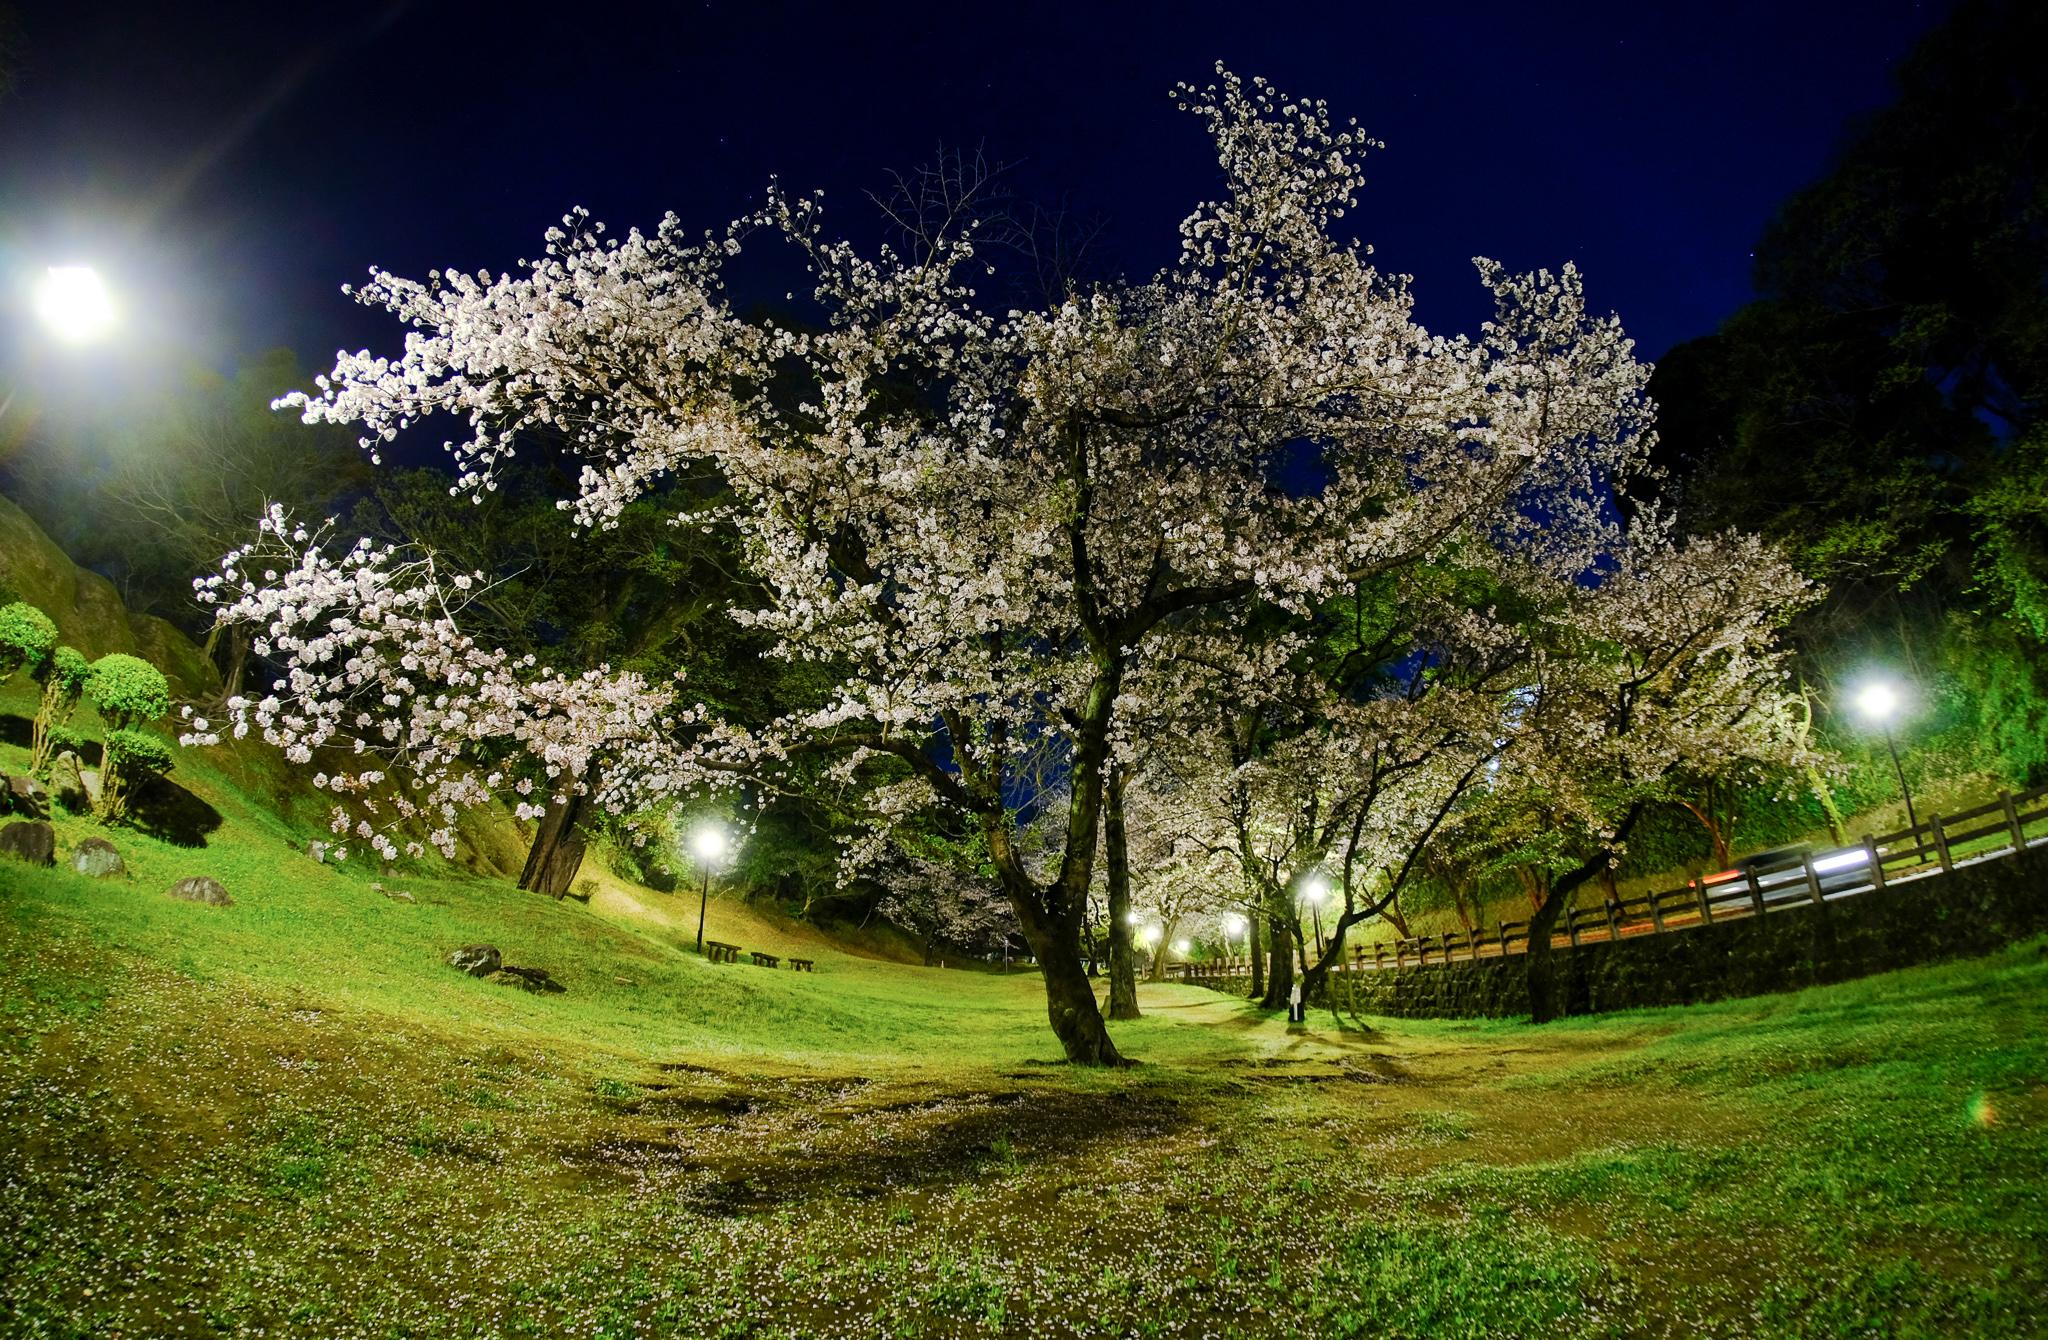 7artisans 7.5mm F2.8 を使った夜桜の撮影